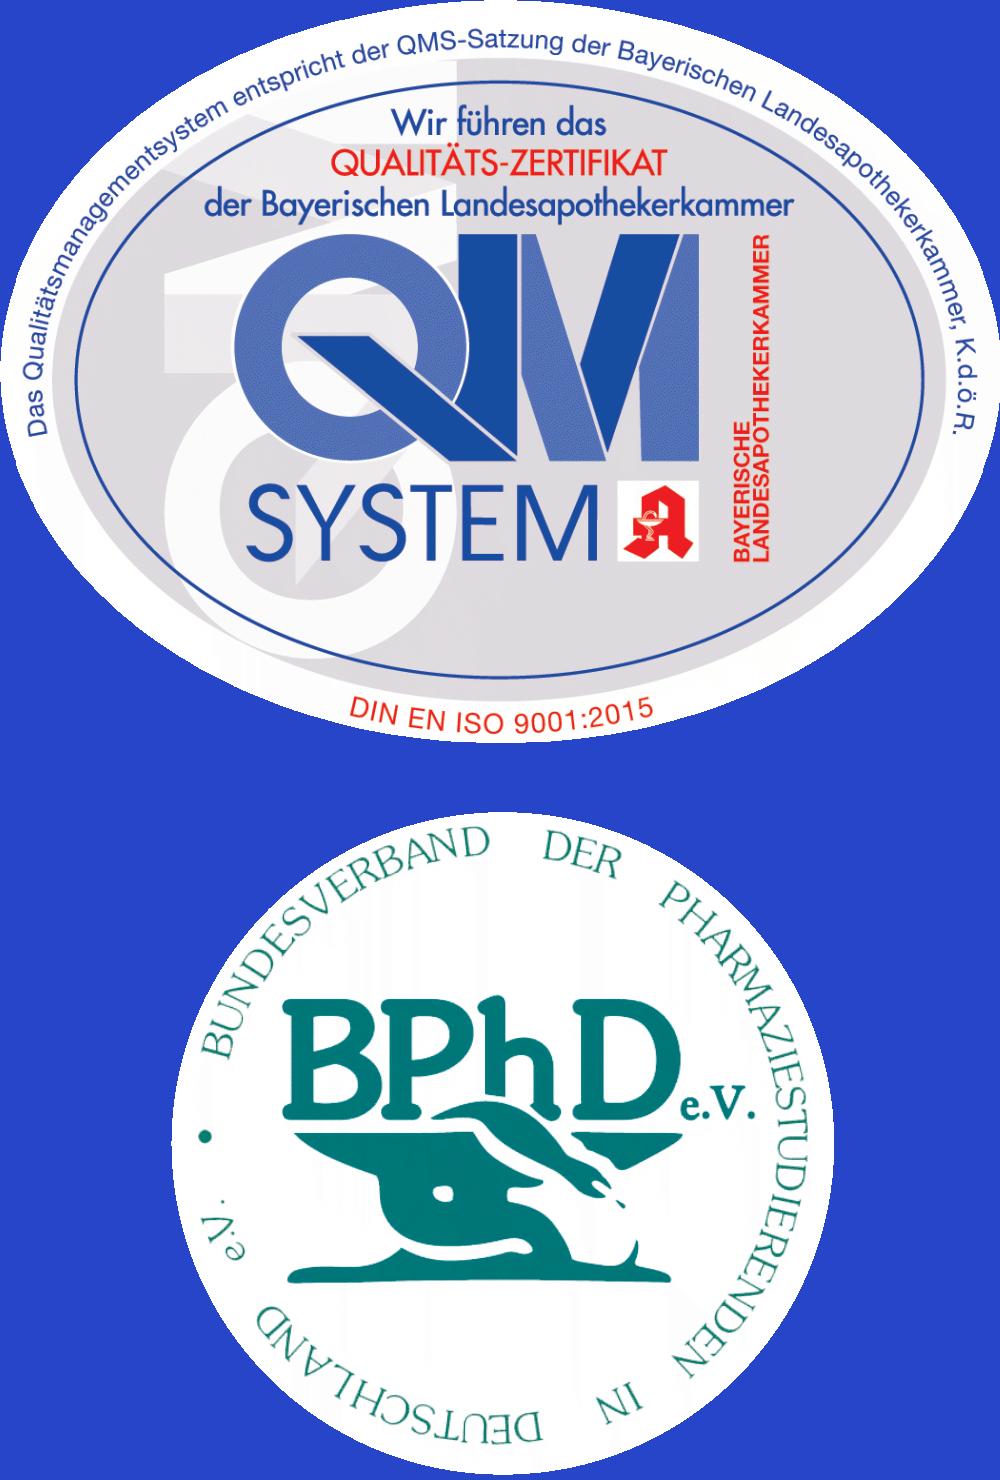 Bayern_QMS_+bphd